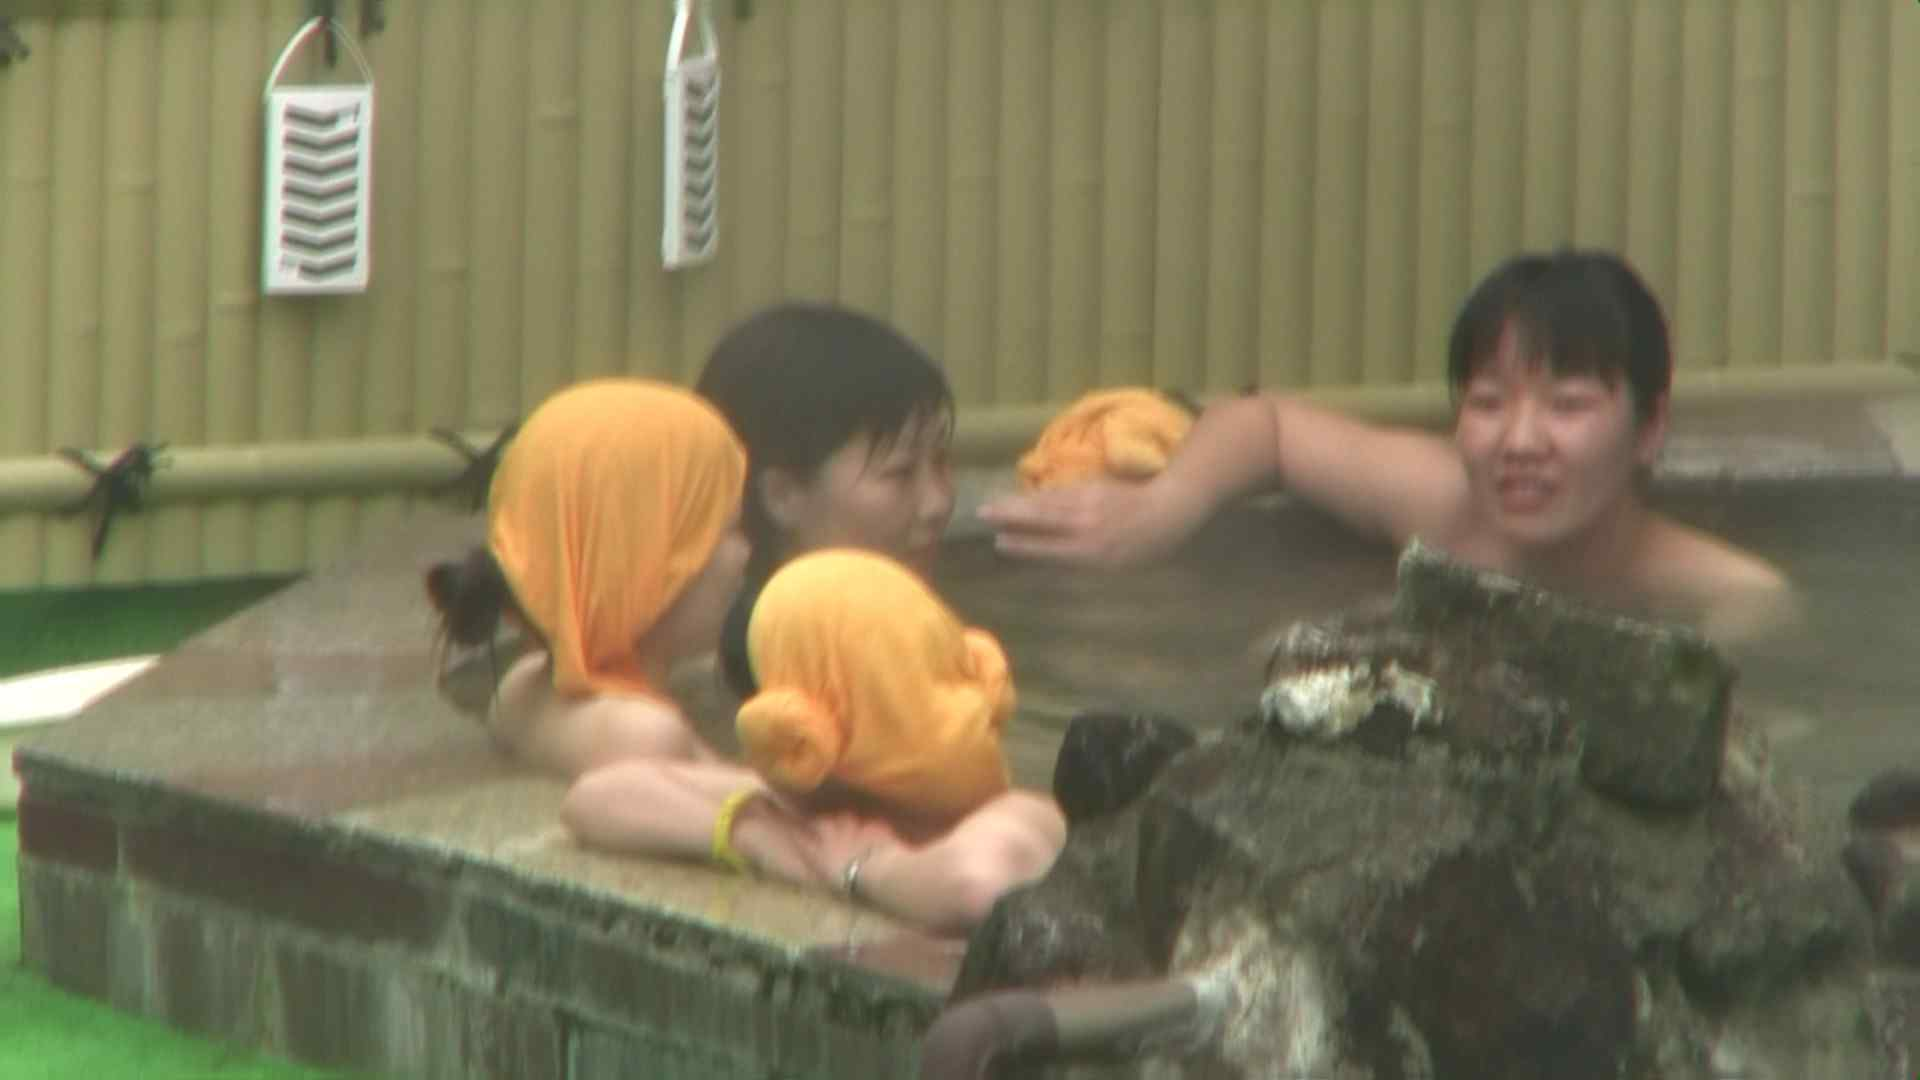 Aquaな露天風呂Vol.73【VIP限定】 盗撮 | HなOL  54pic 15